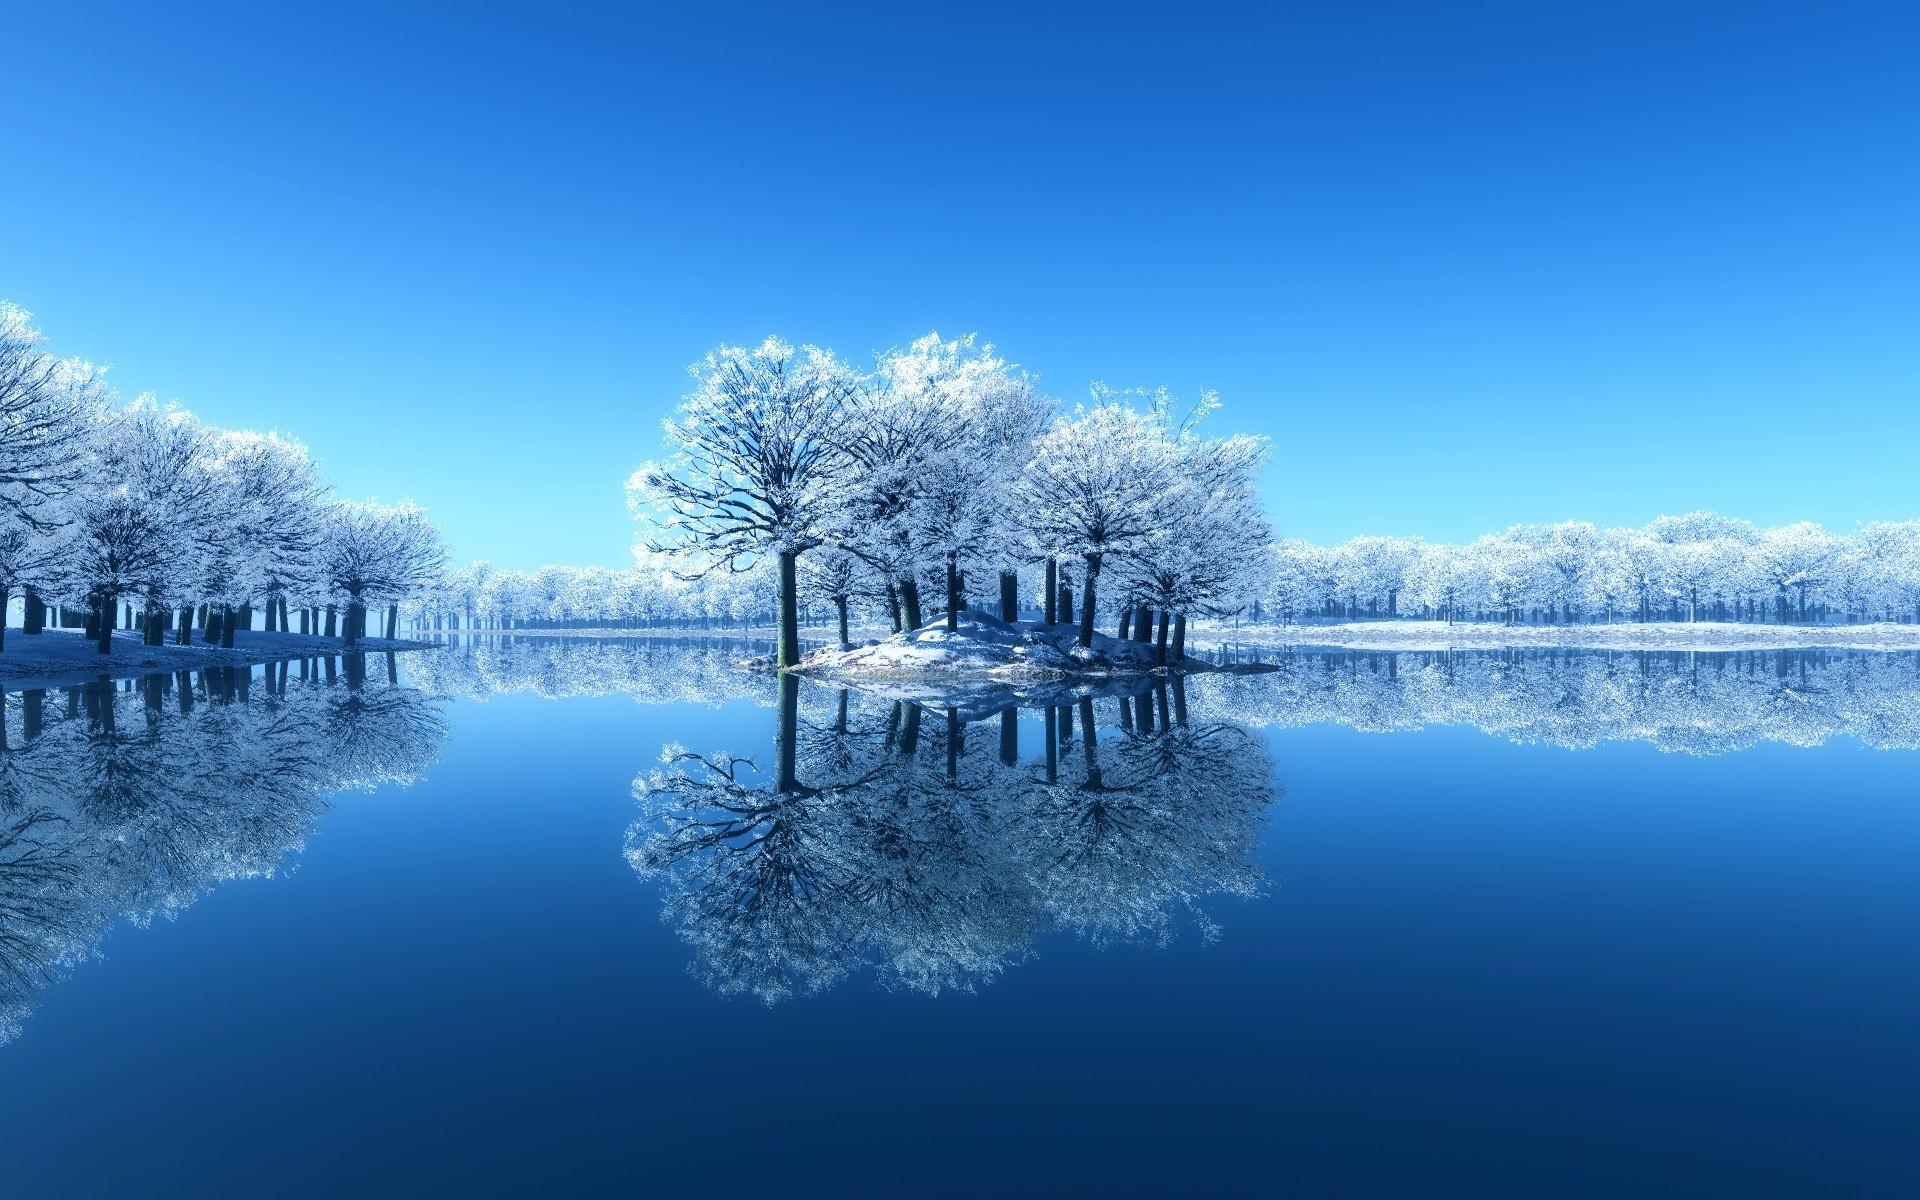 Winter Pictures For Desktop Background 69 Images